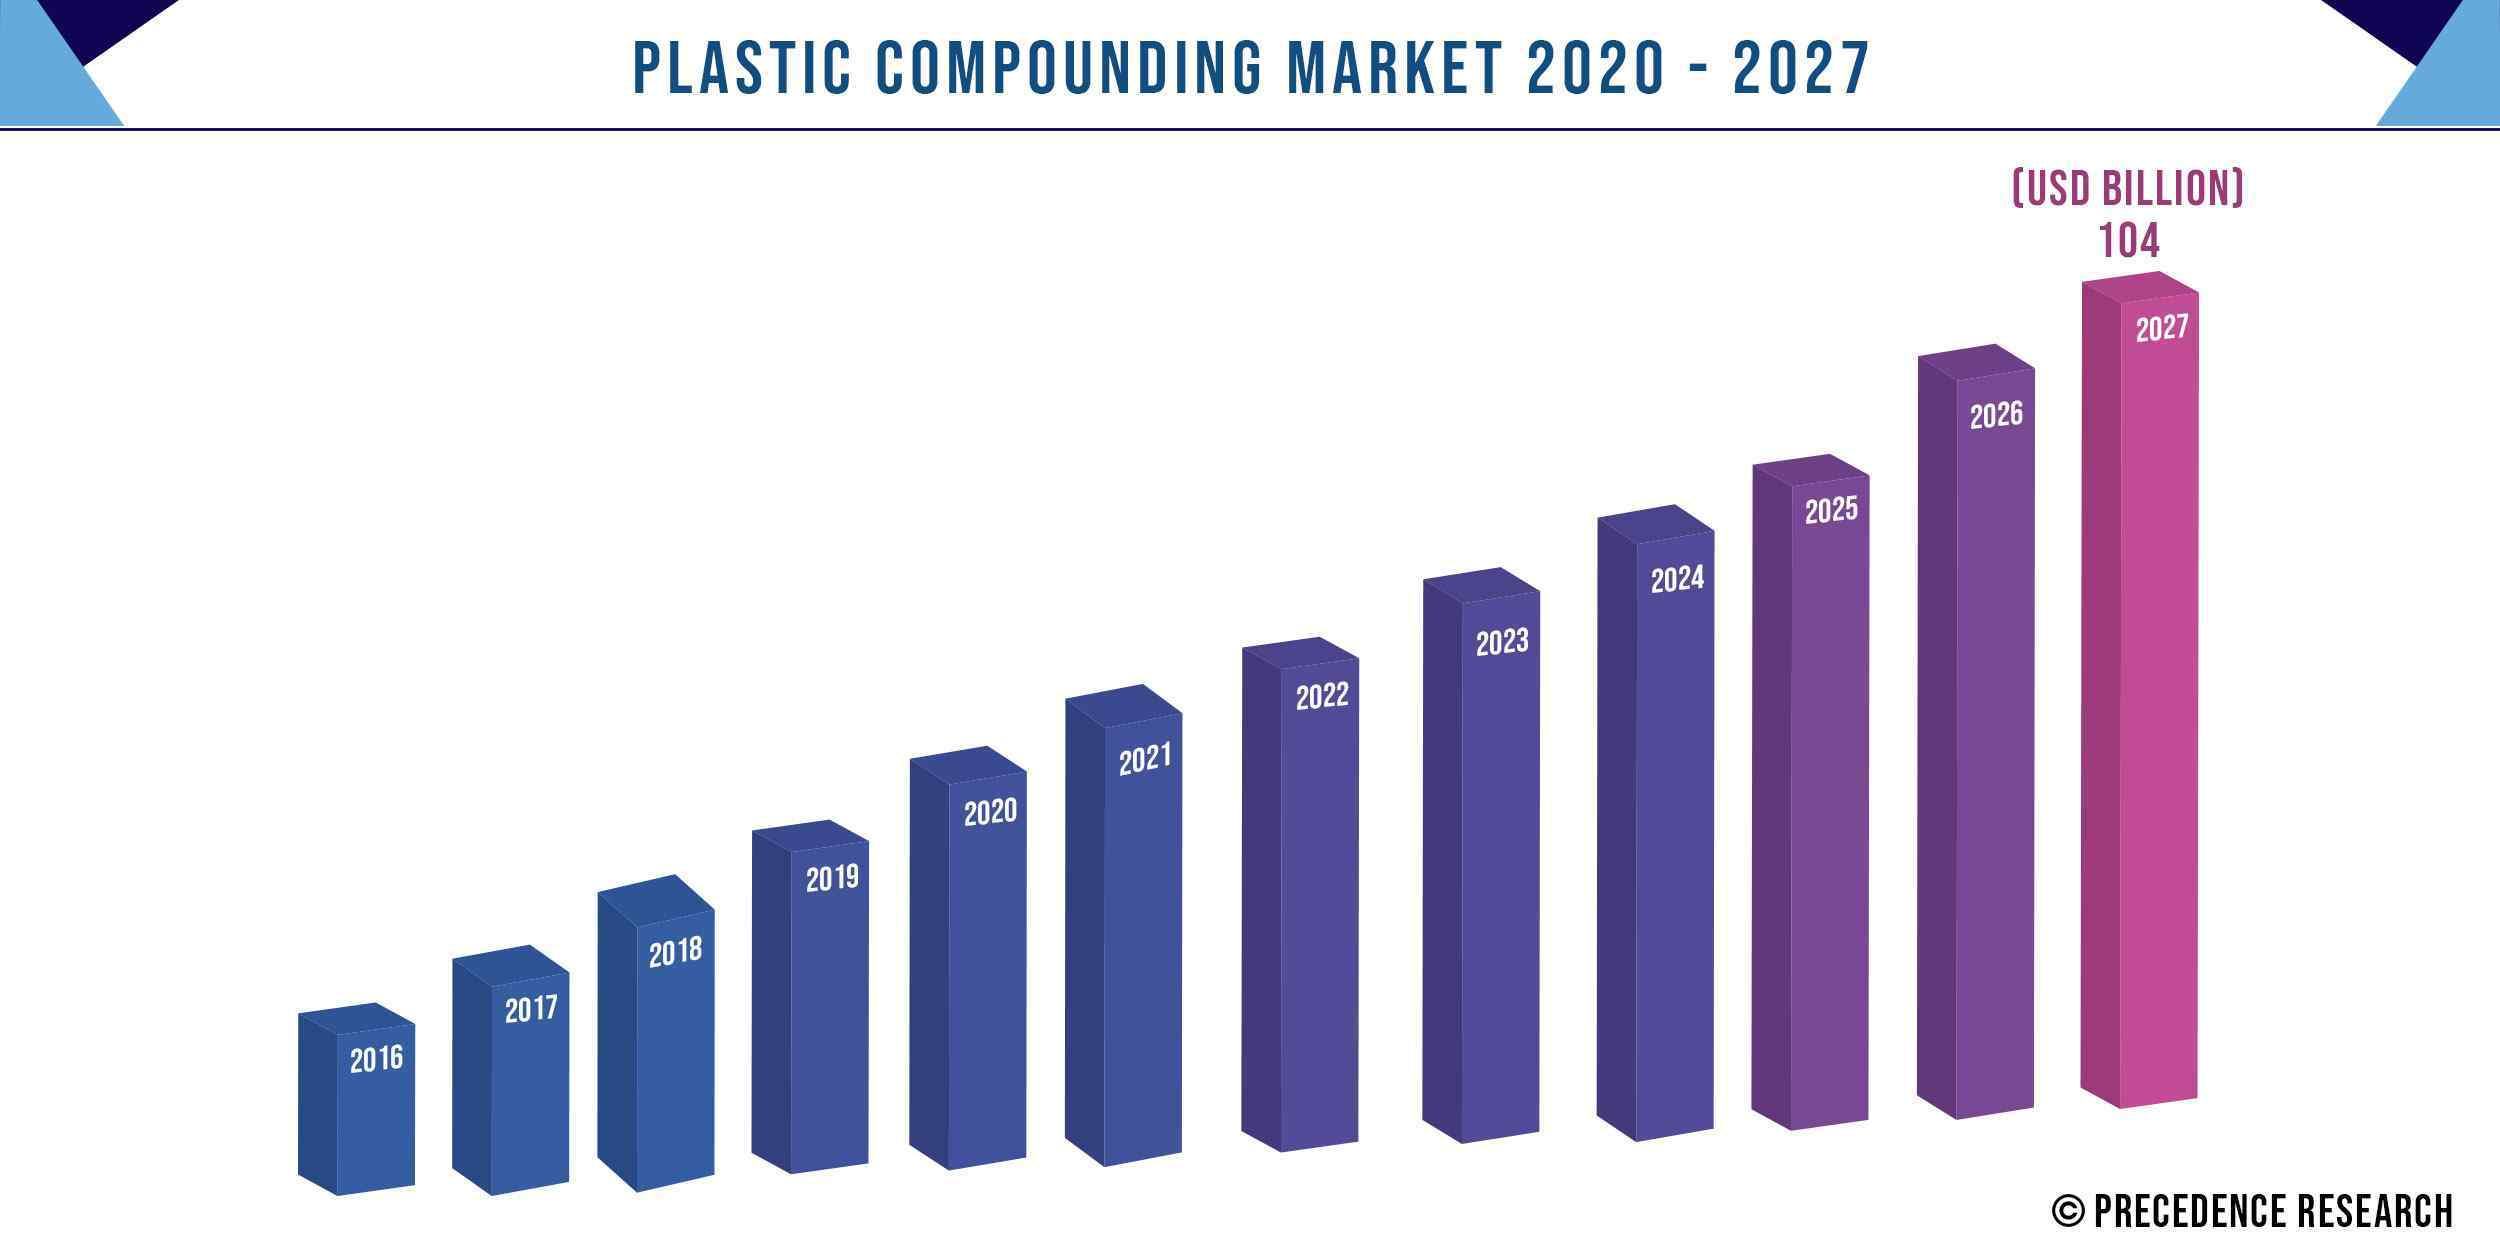 Plastic Compounding Market Size 2016 to 2027